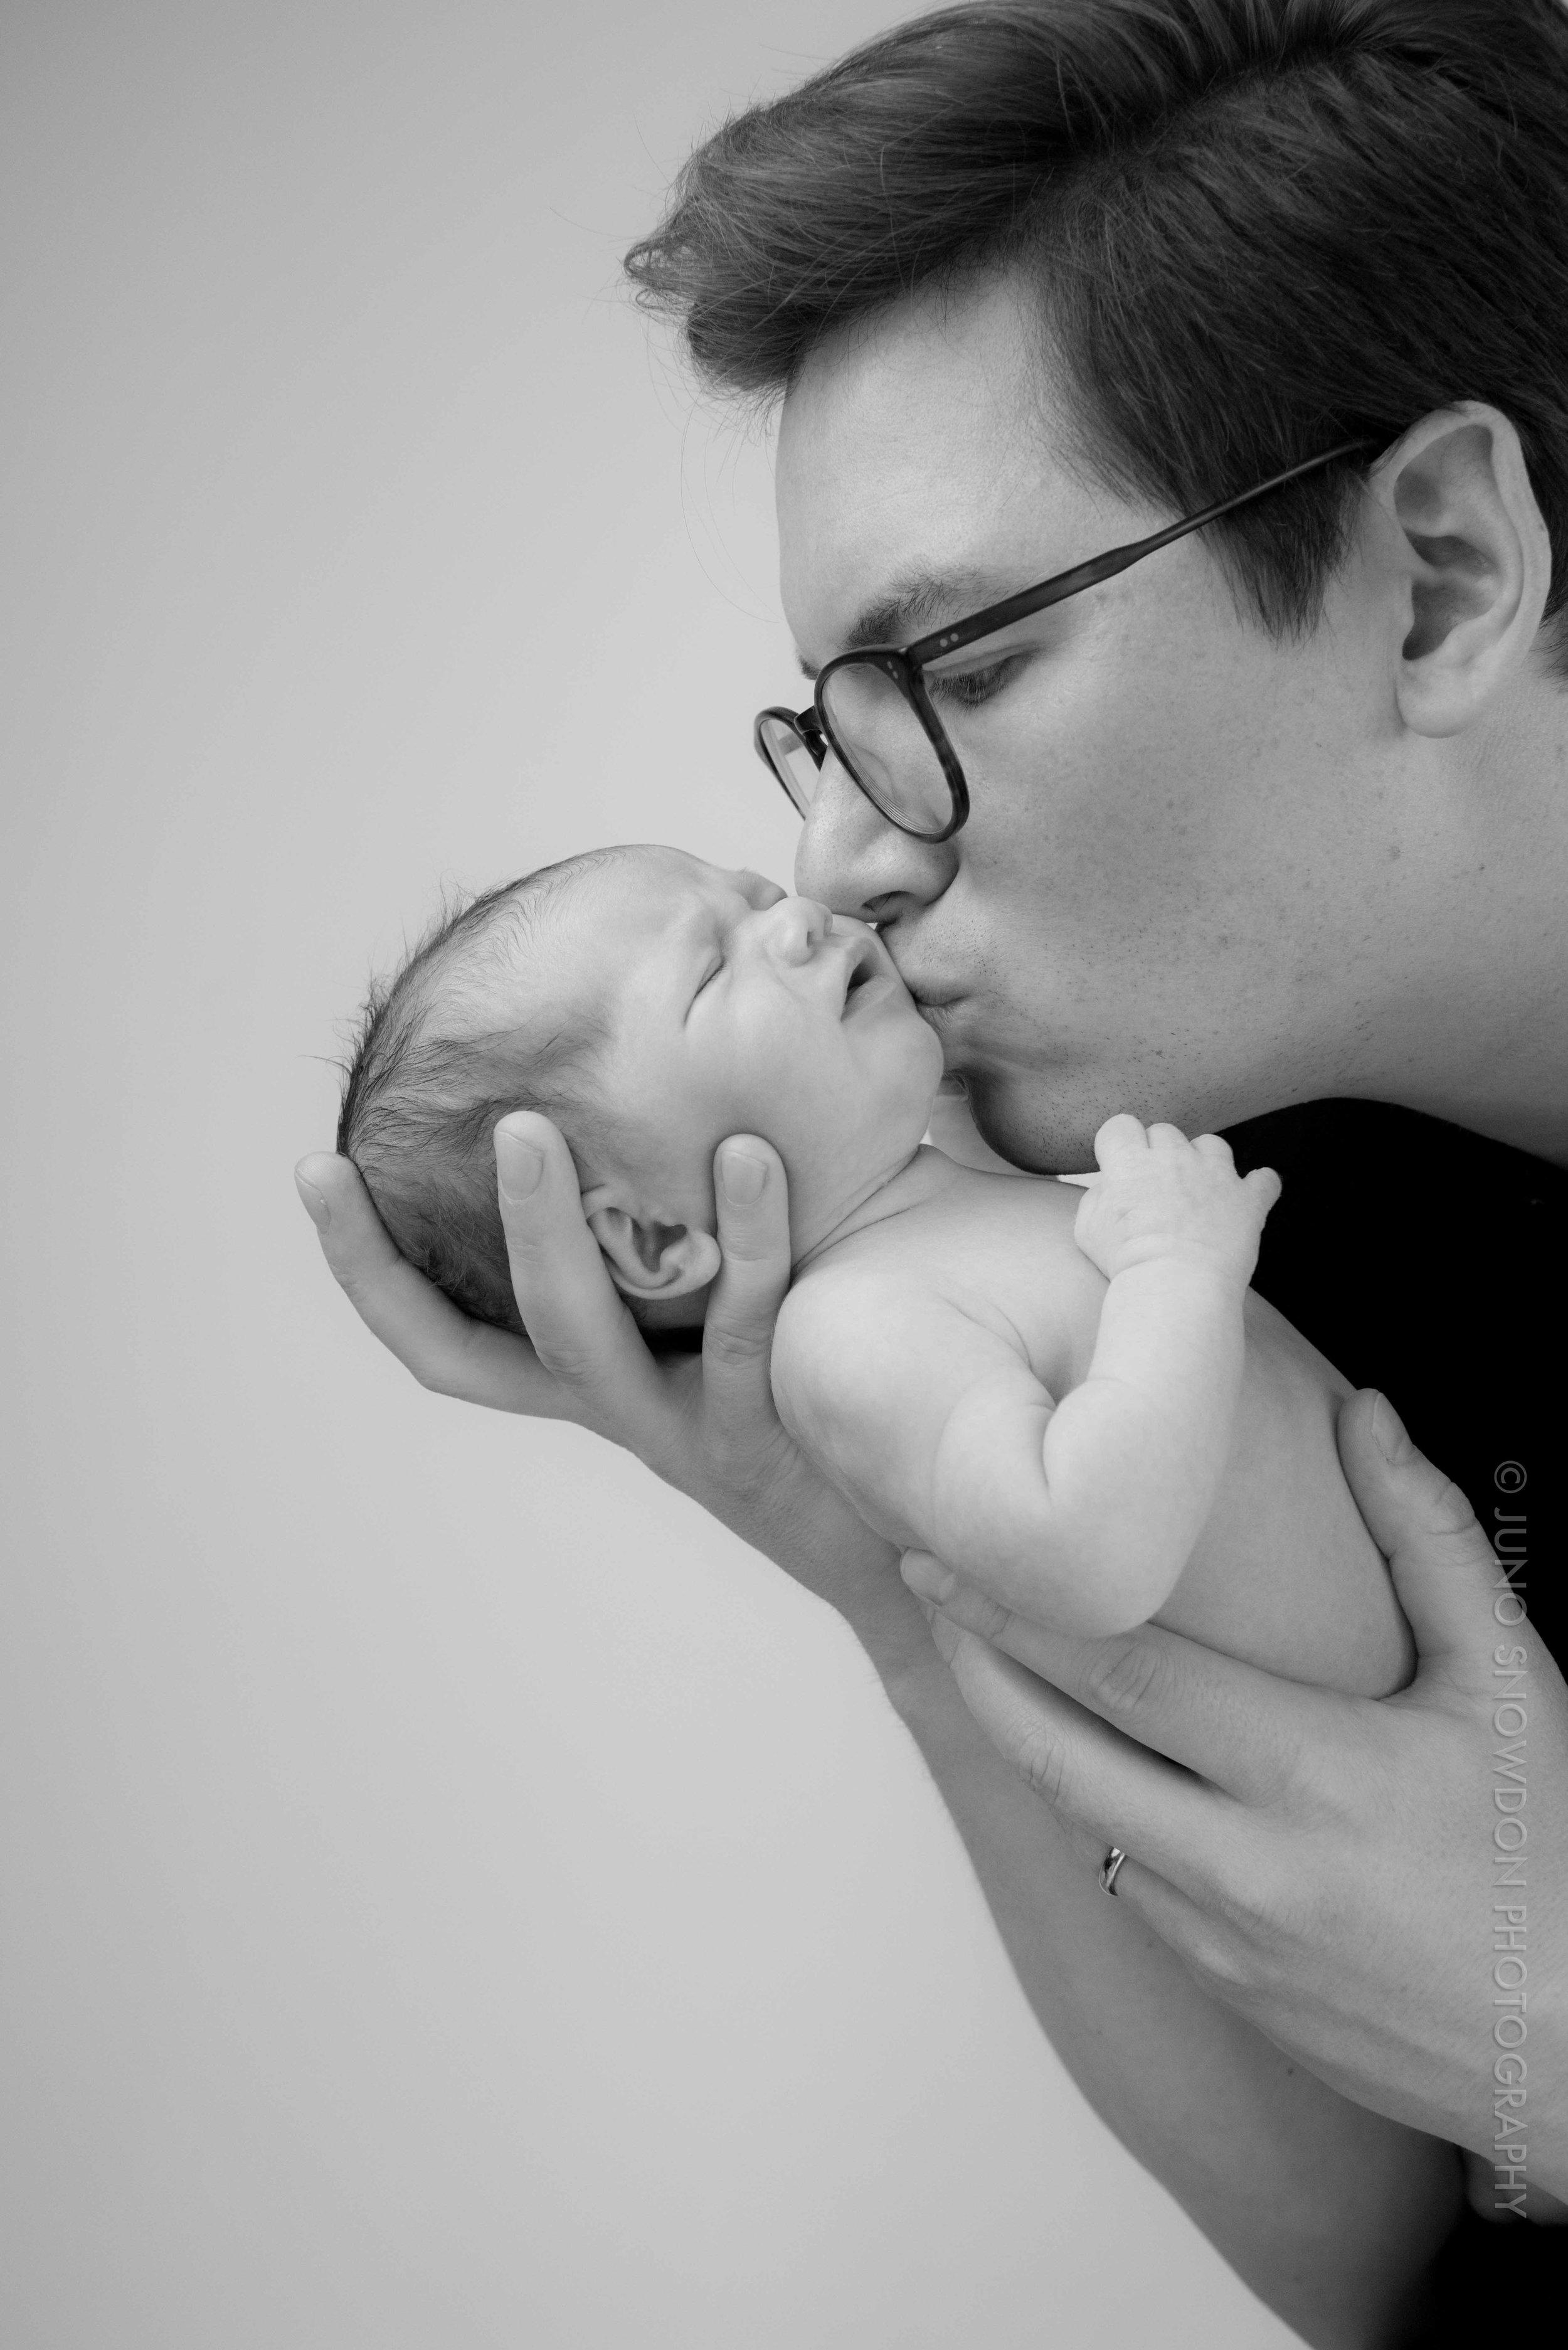 juno-snowdon-photography-newborn-portrait-7124.jpg